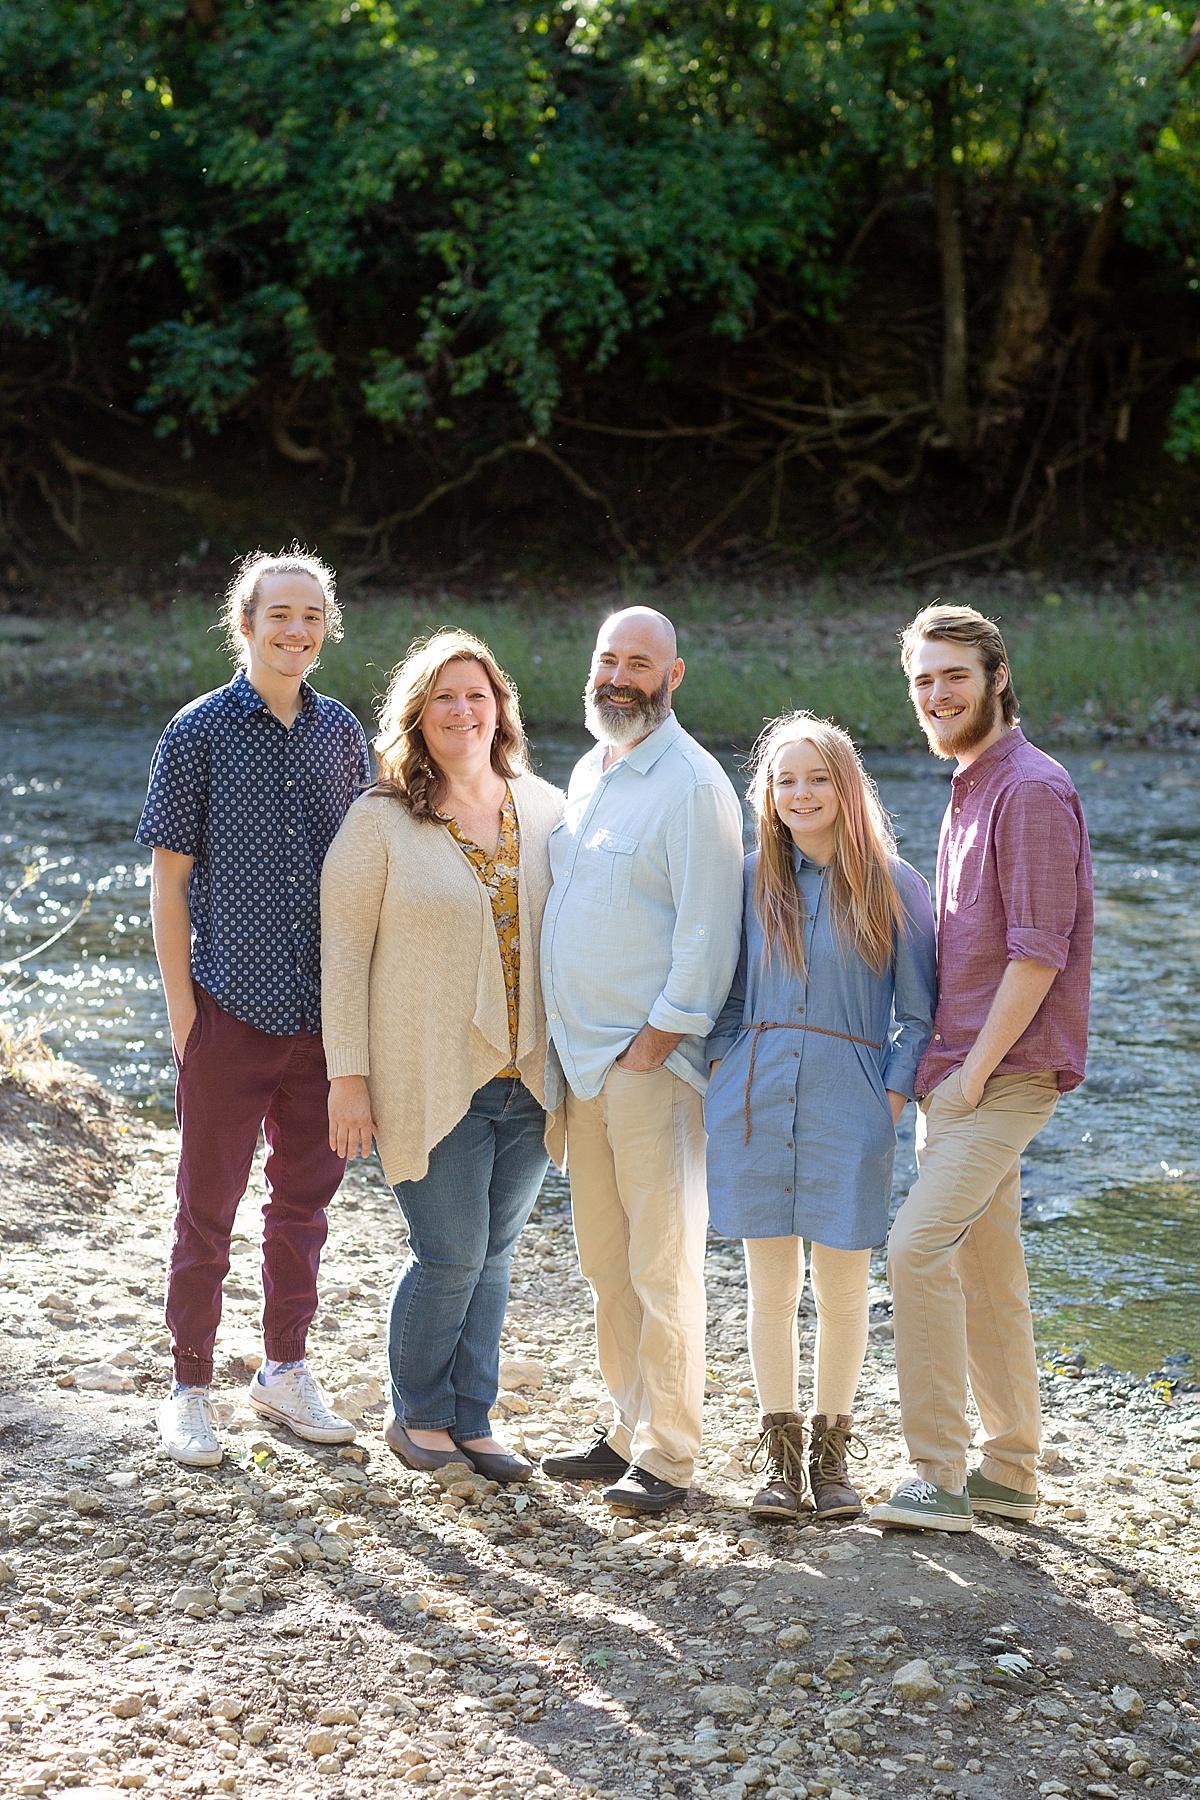 louisville-creek-family-photos-05.JPG